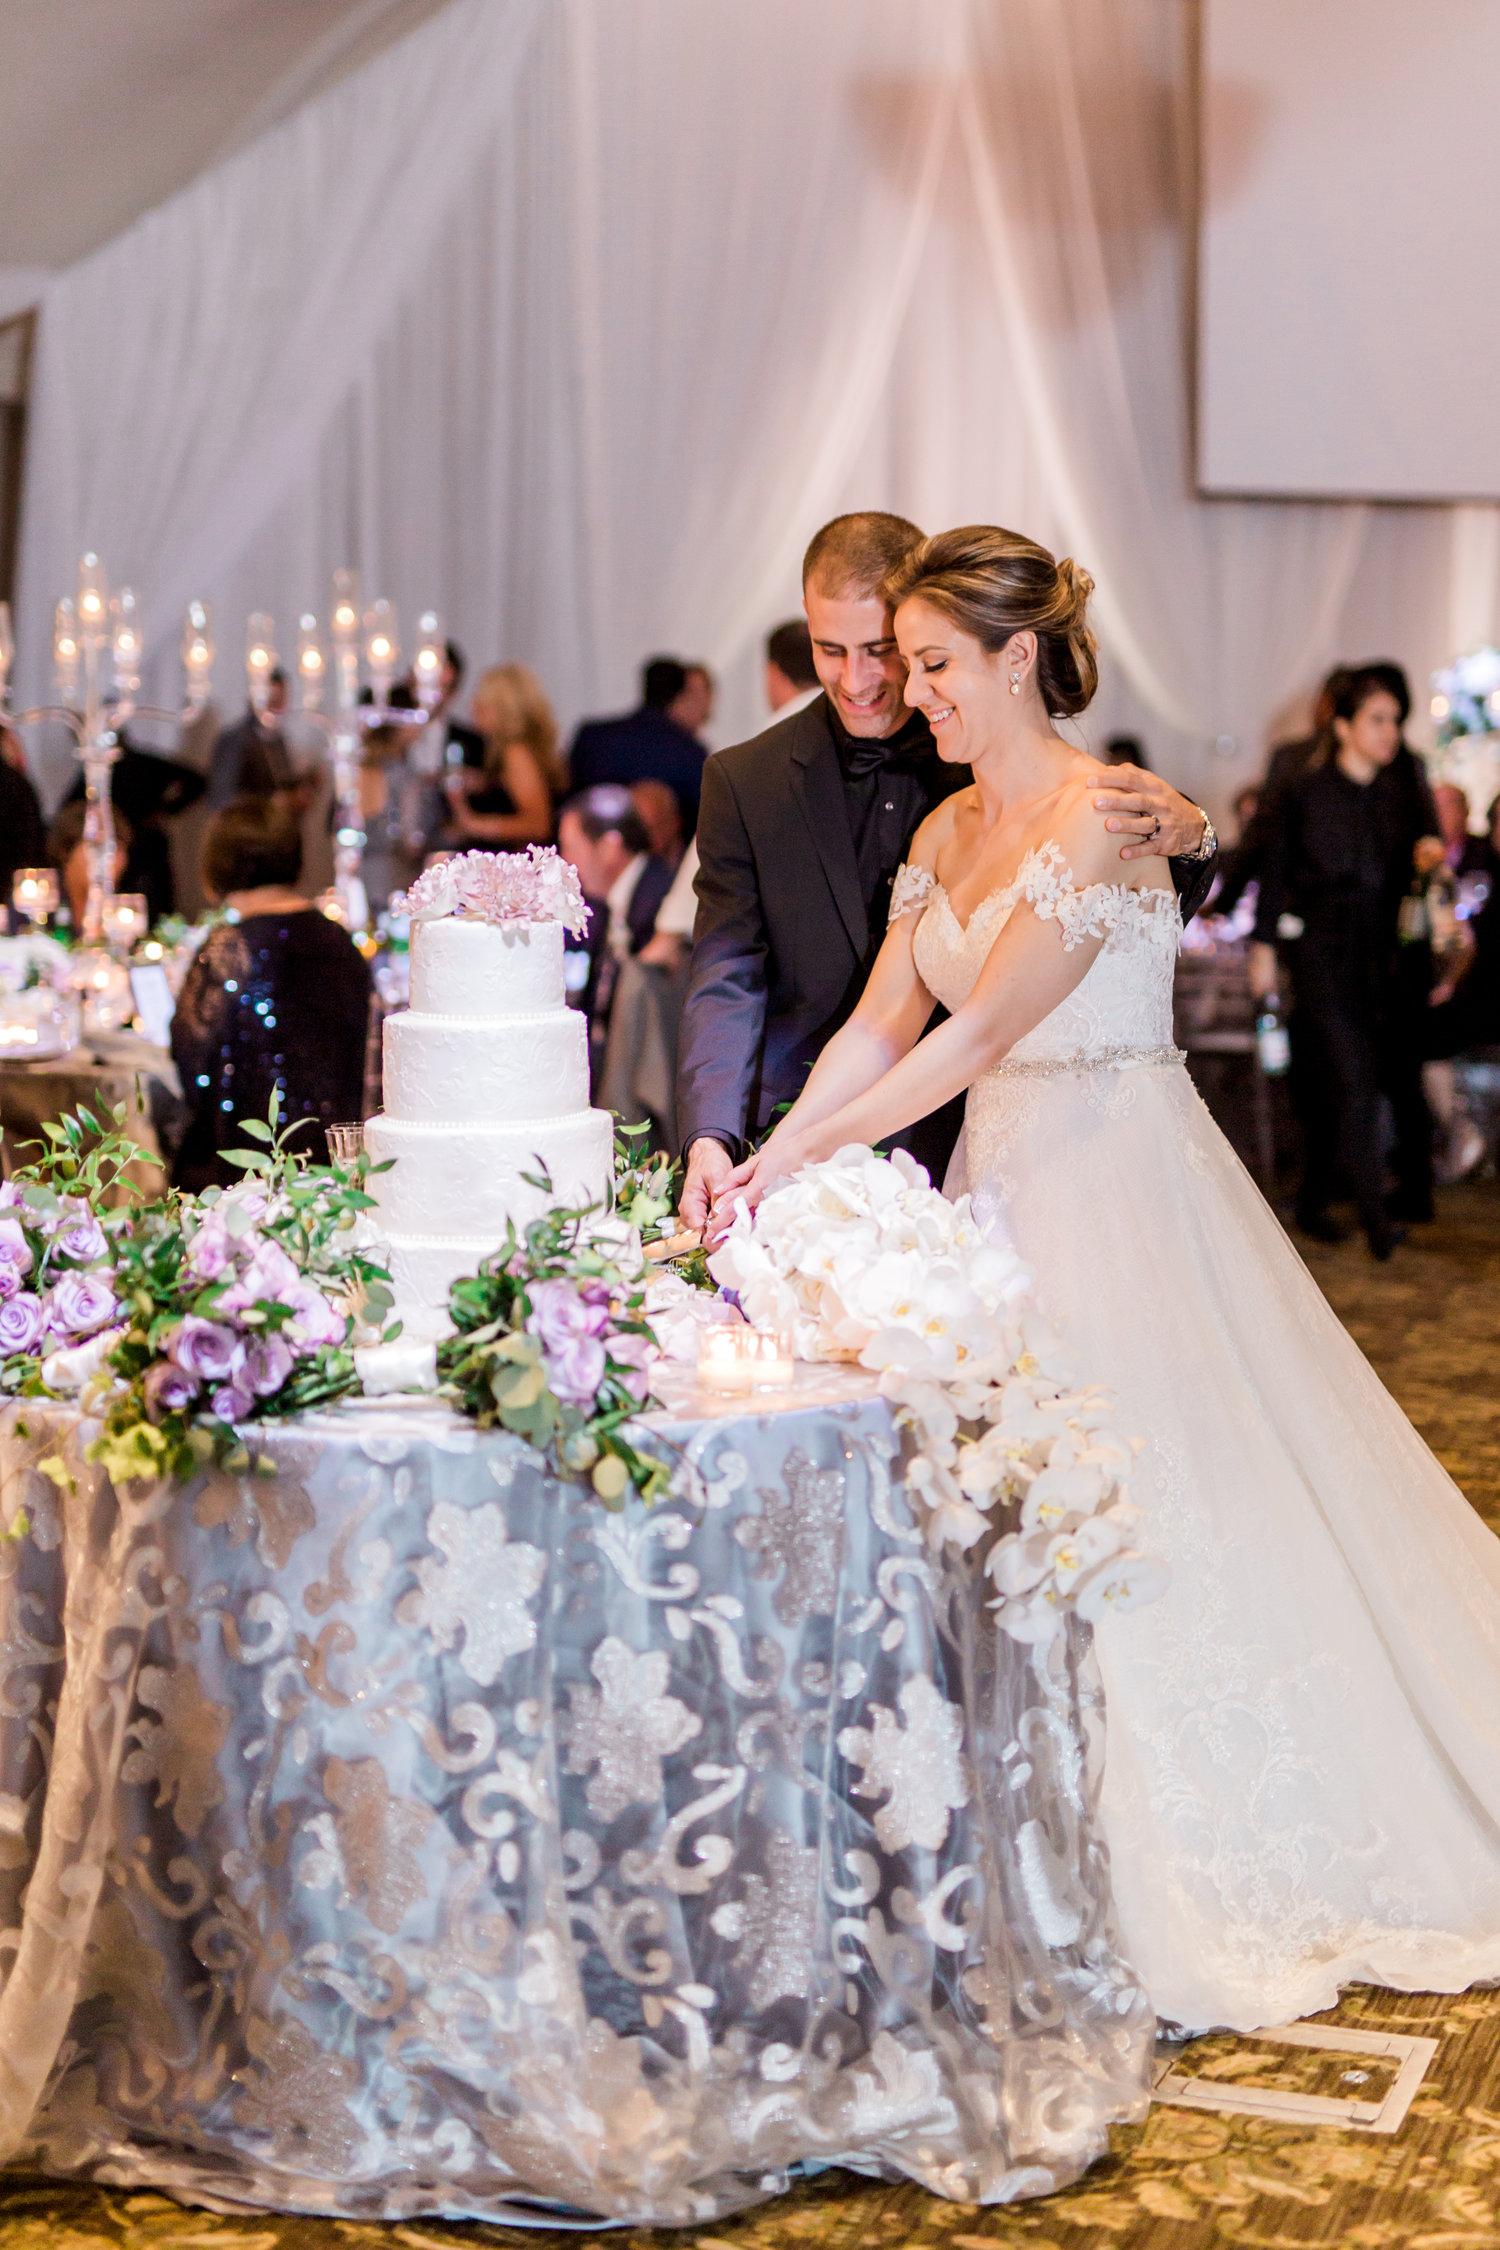 Danielle-Giroux-Amir-Golbazi-Toronto-Wedding-Photographer-Bellvue-Manor_DeLuca_2-643.jpg